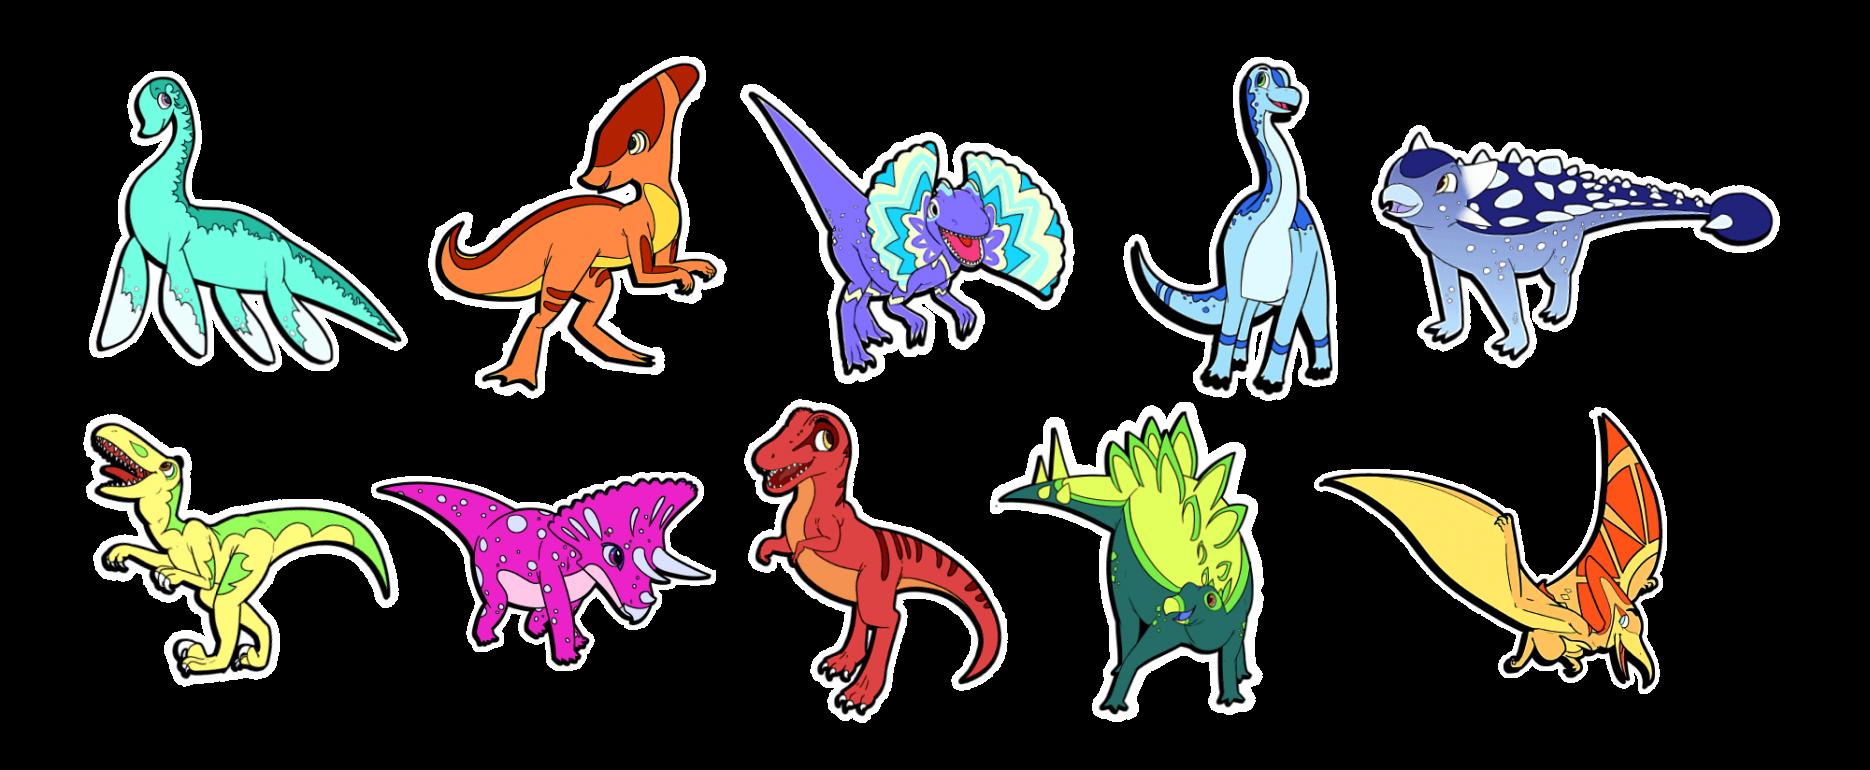 tatouage-stickers-TRex-velociraptor-pterodactyl